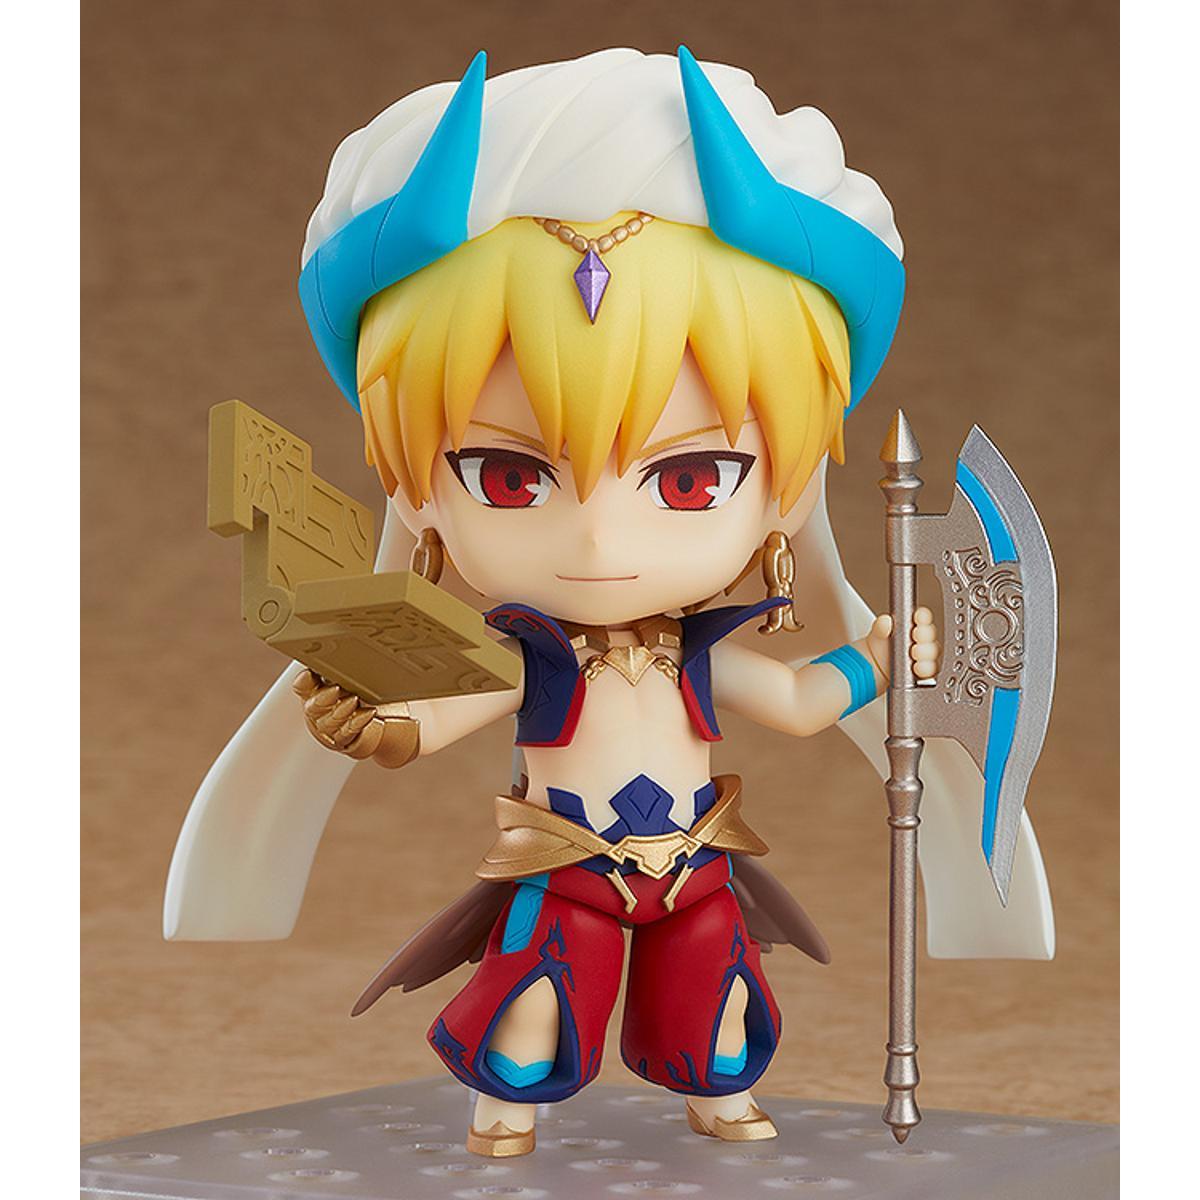 Nendoroid Caster/Gilgamesh: Ascension Ver. (Rerelease)